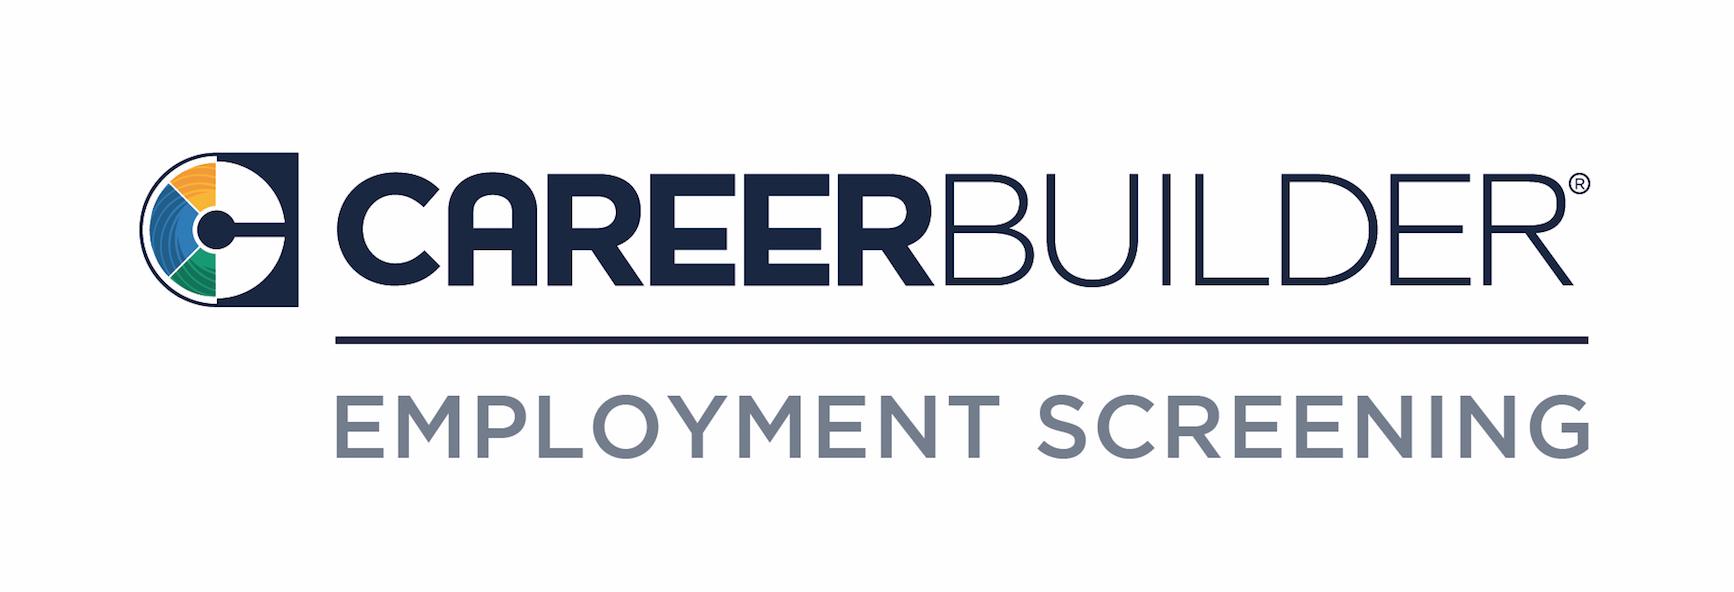 CB-Employment-screening-logo